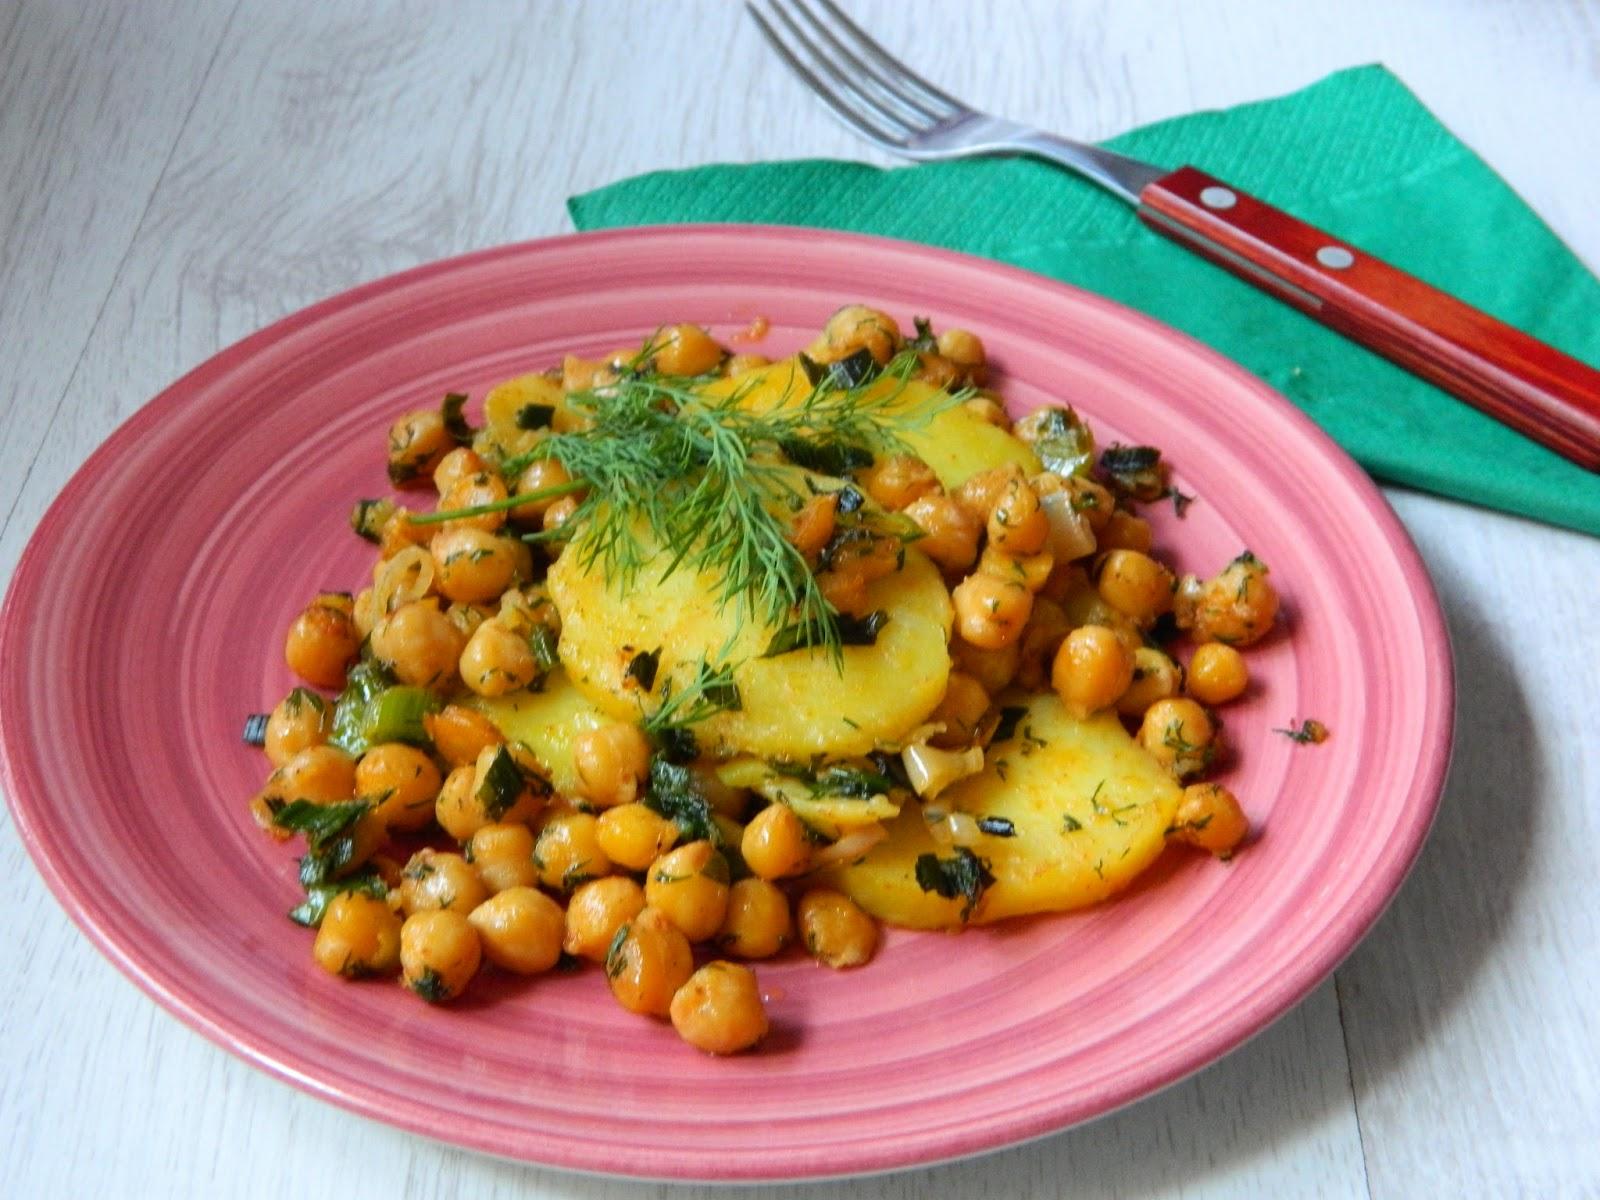 Cartofi cu usturoi verde si naut